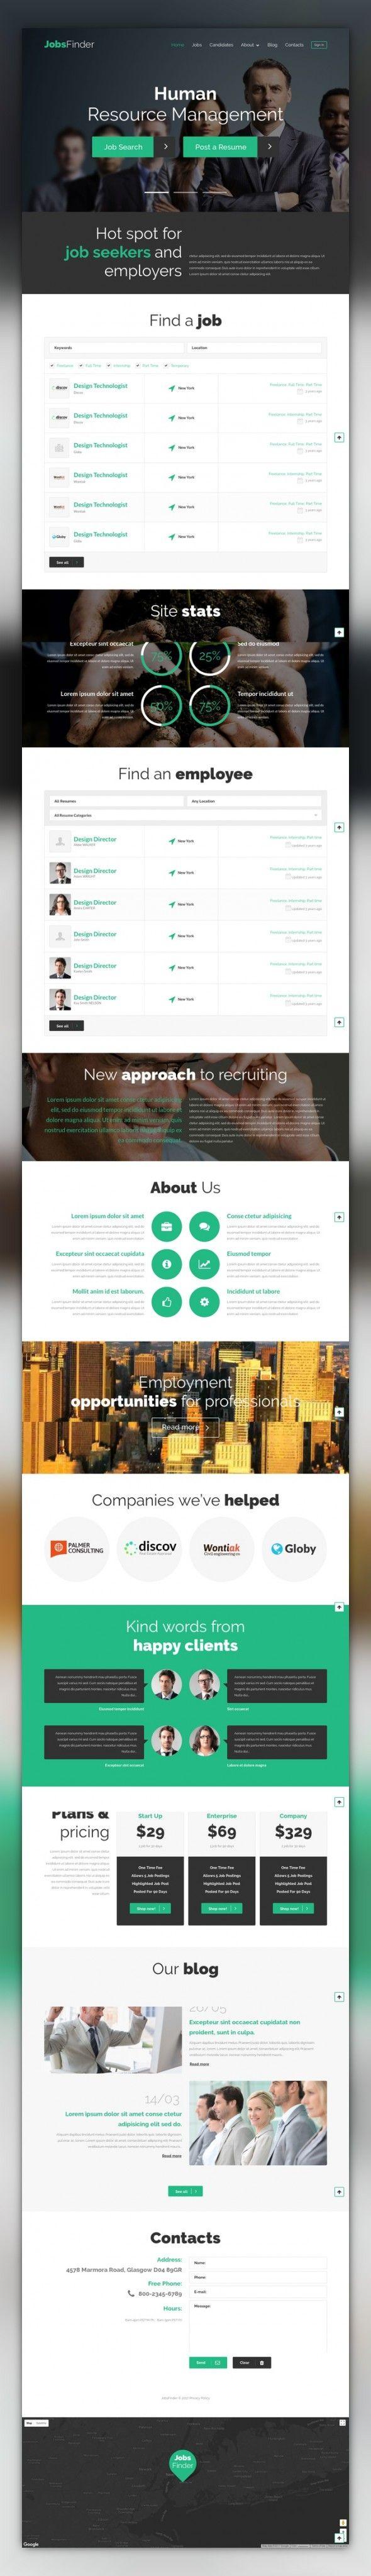 The mentor network employee portal - Job Portal Responsive Wordpress Theme Cms Blog Templates Wordpress Themes Business Services